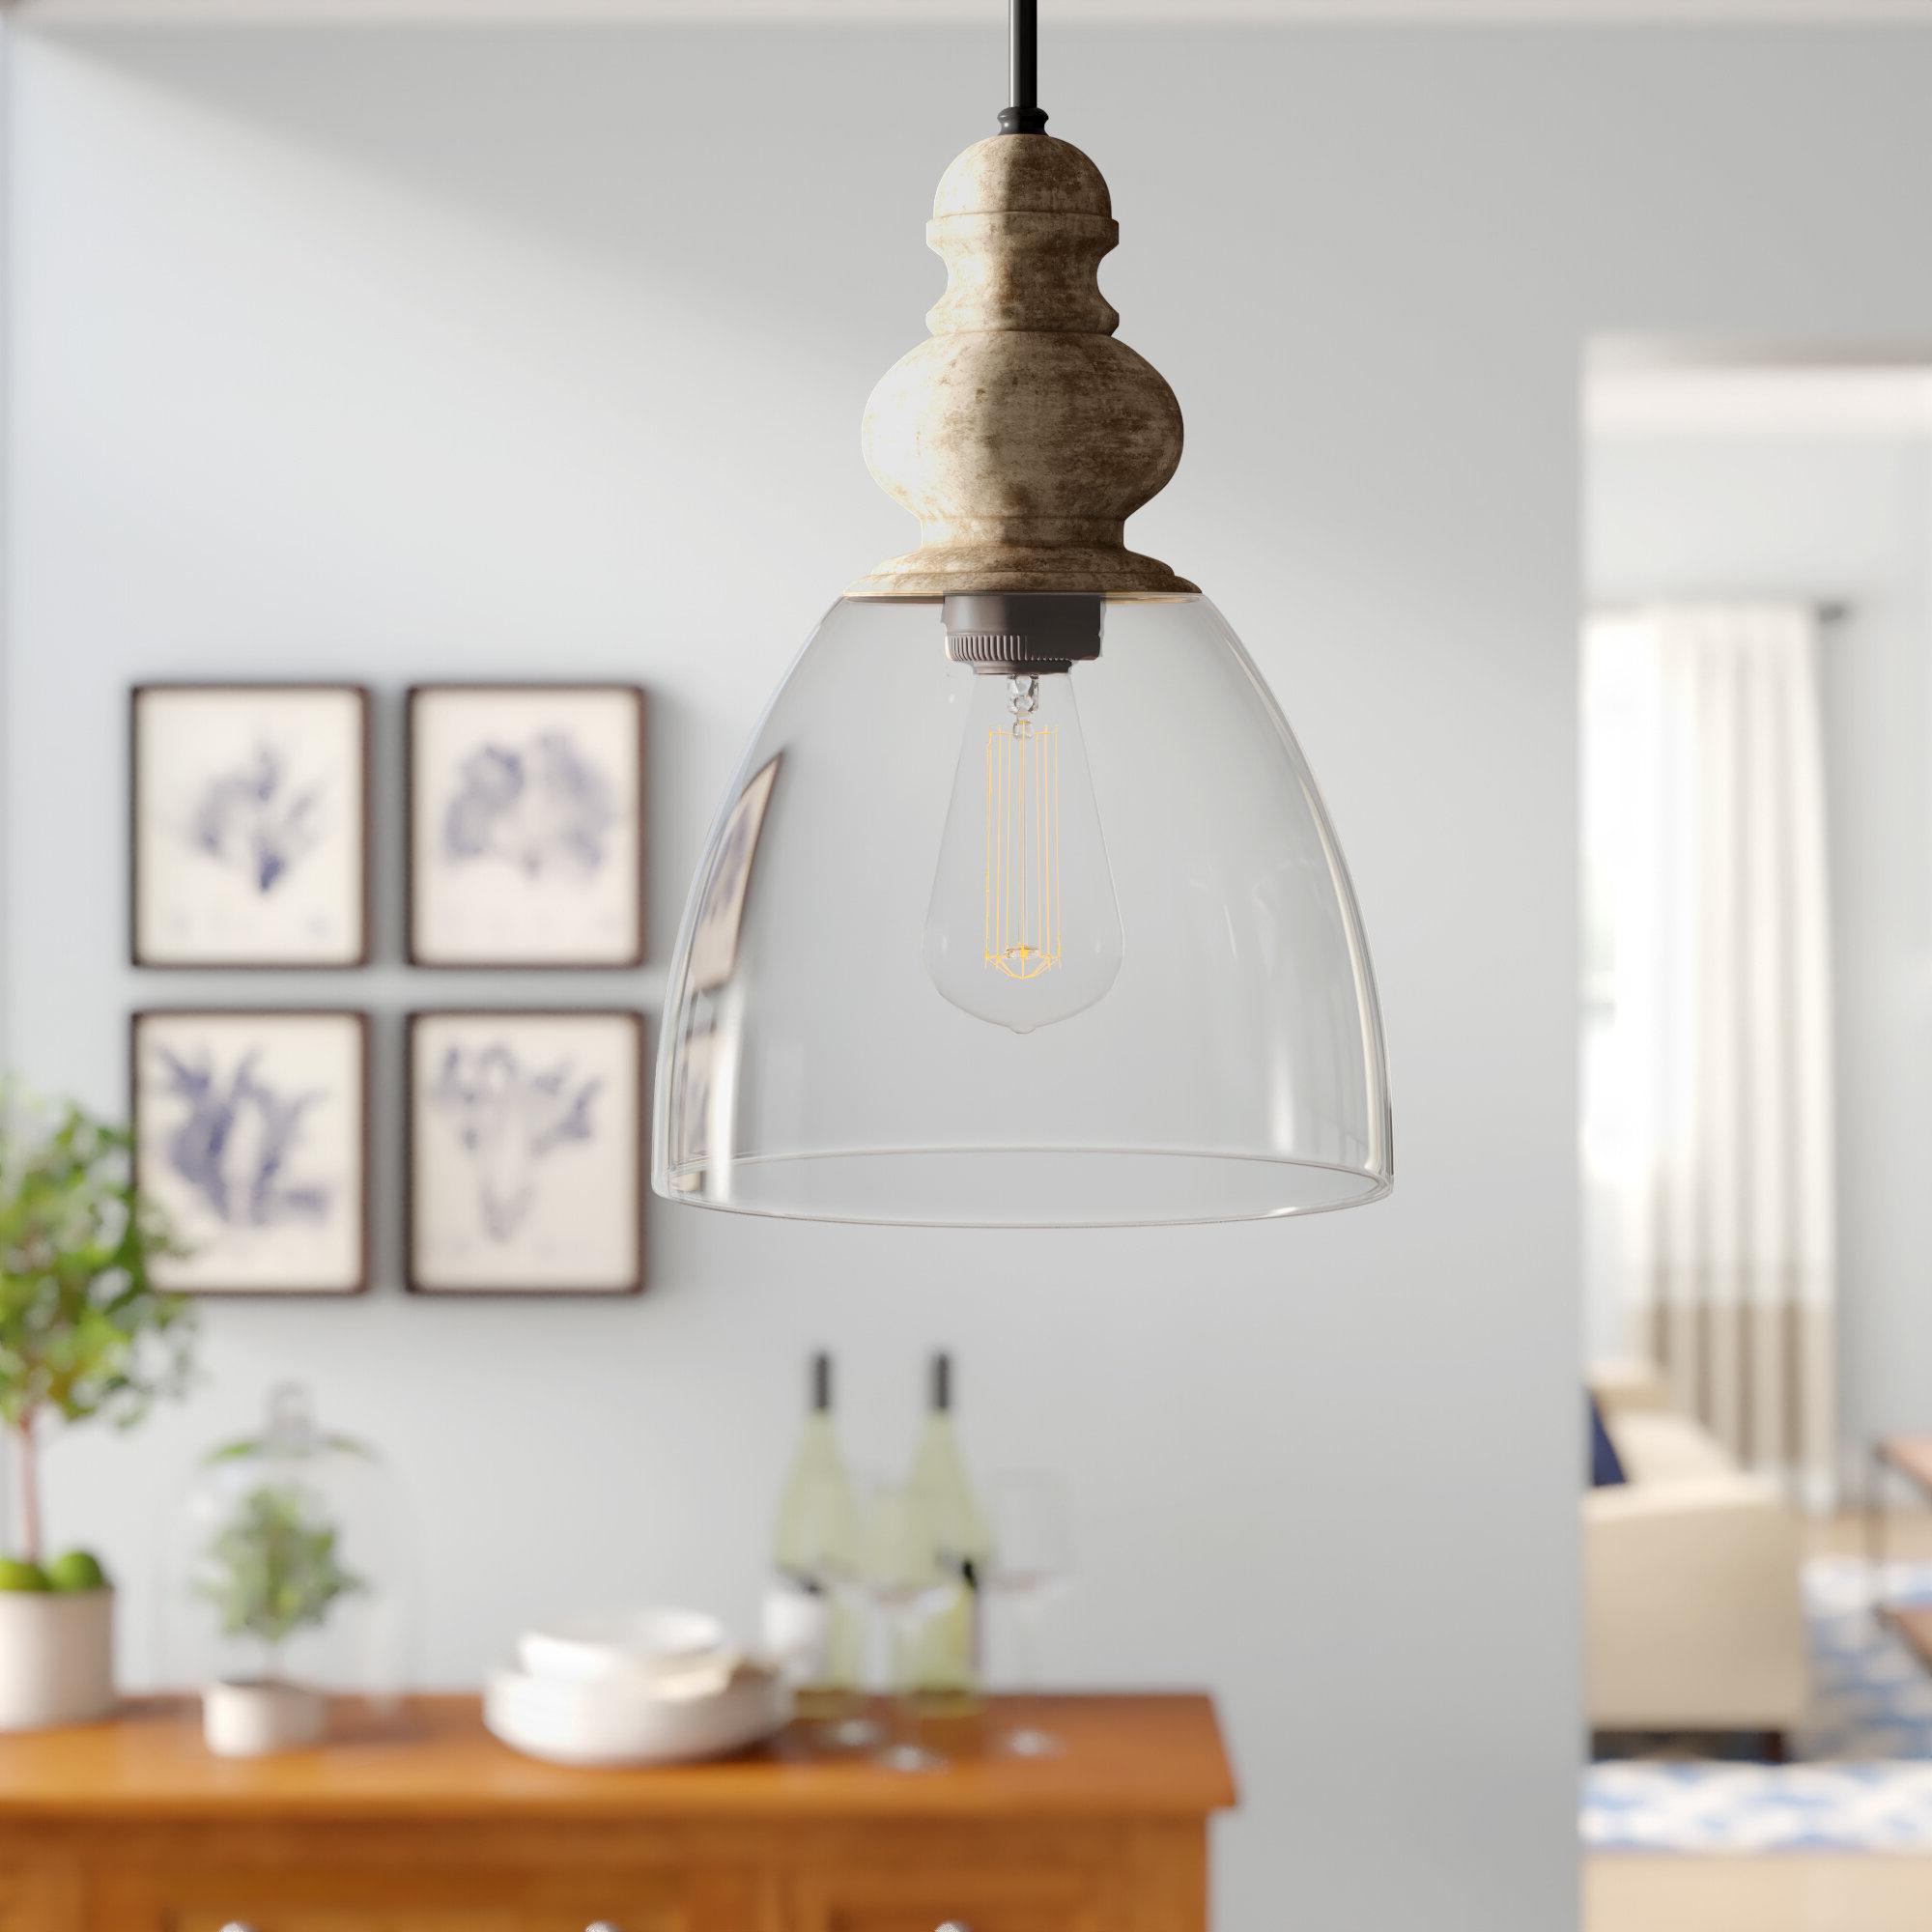 Laurel Foundry Modern Farmhouse Lemelle 1 Light Single Bell Pendant Pertaining To Famous Erico 1 Light Single Bell Pendants (View 17 of 25)